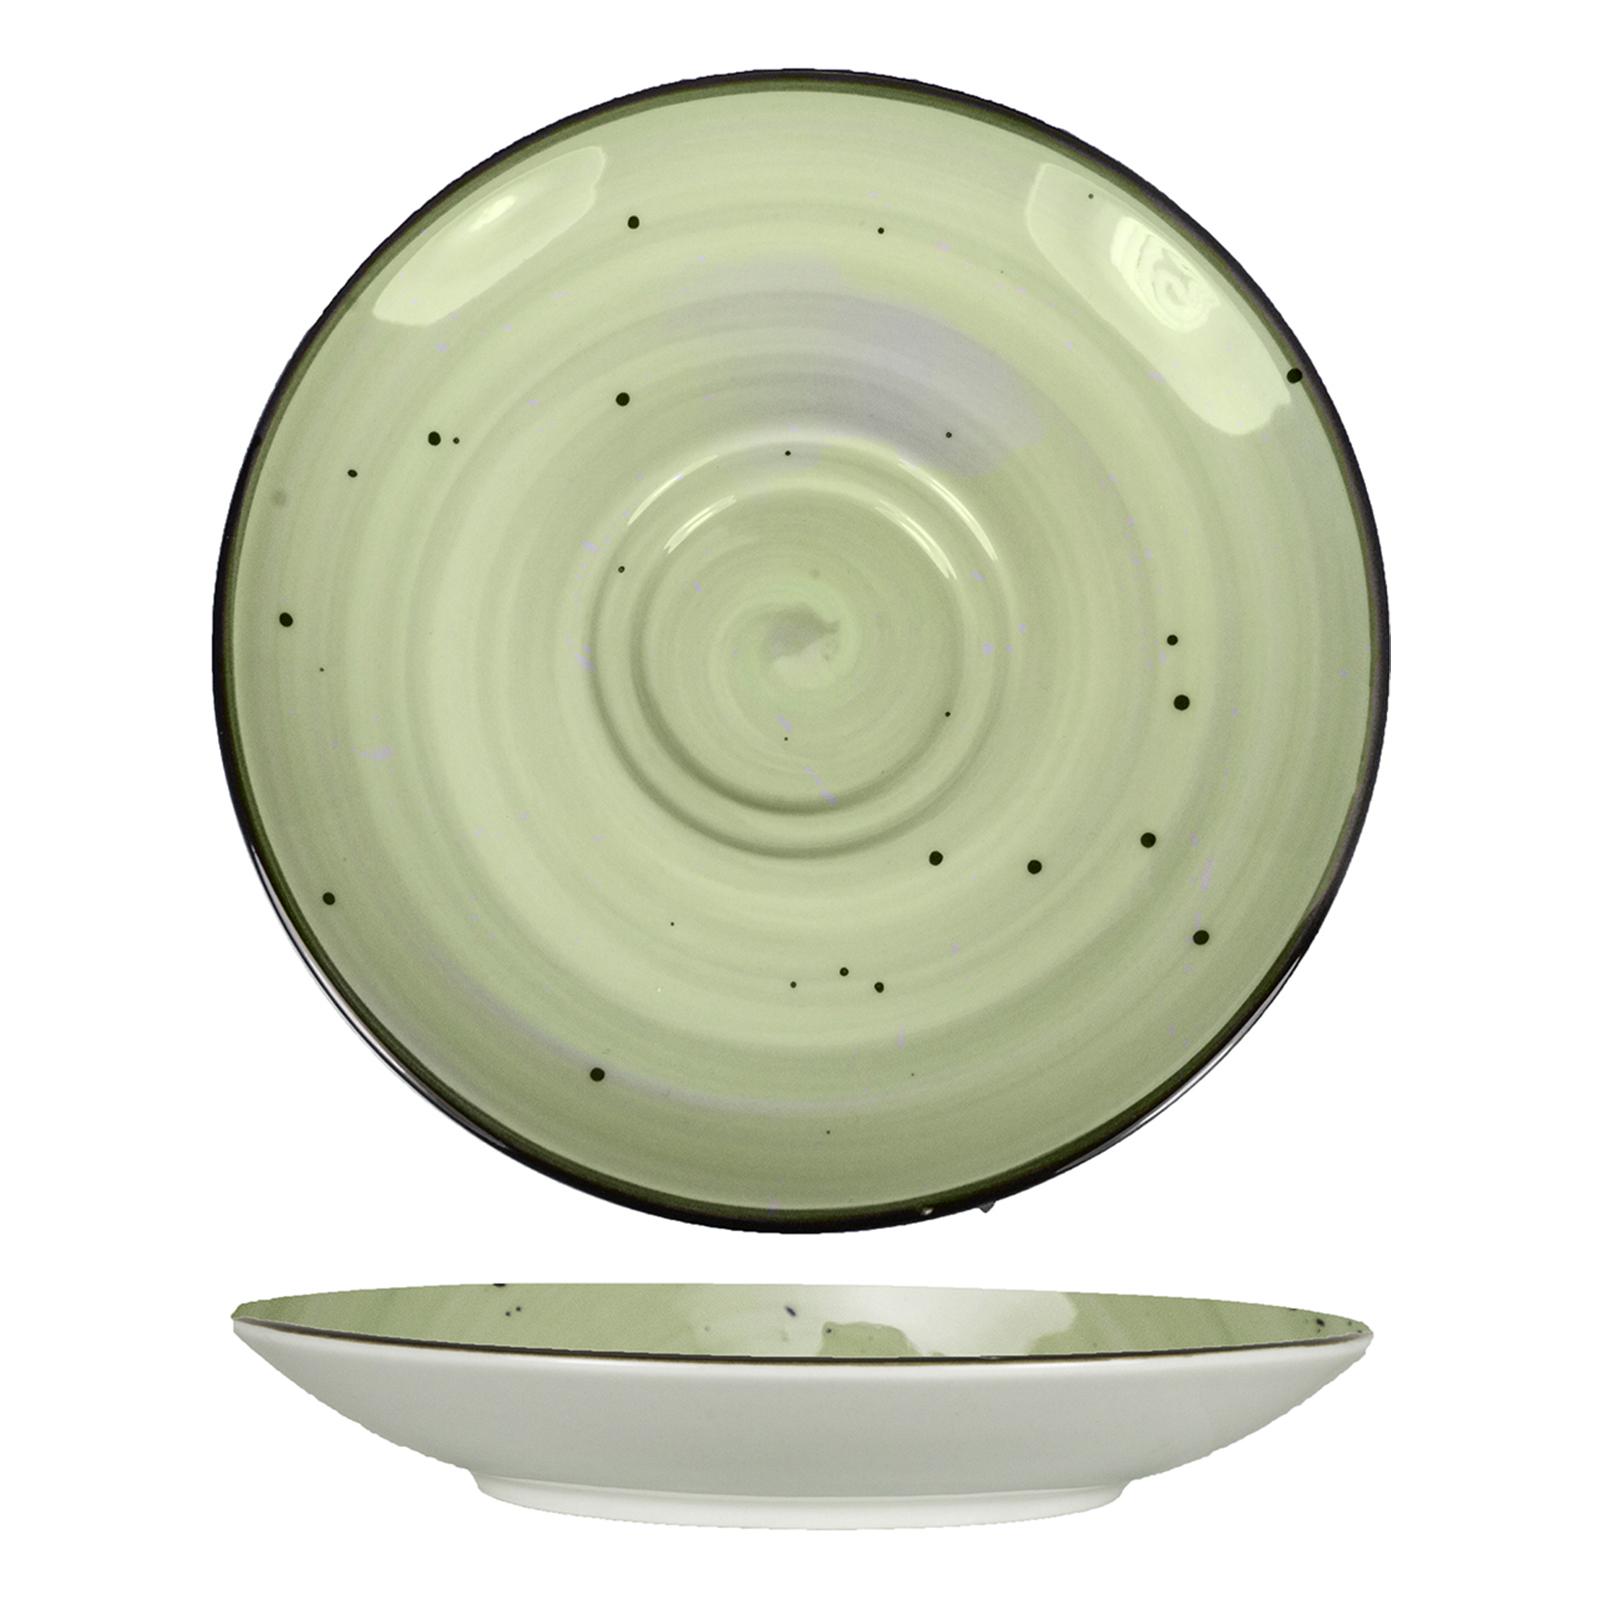 International Tableware RT-2-LI saucer, china